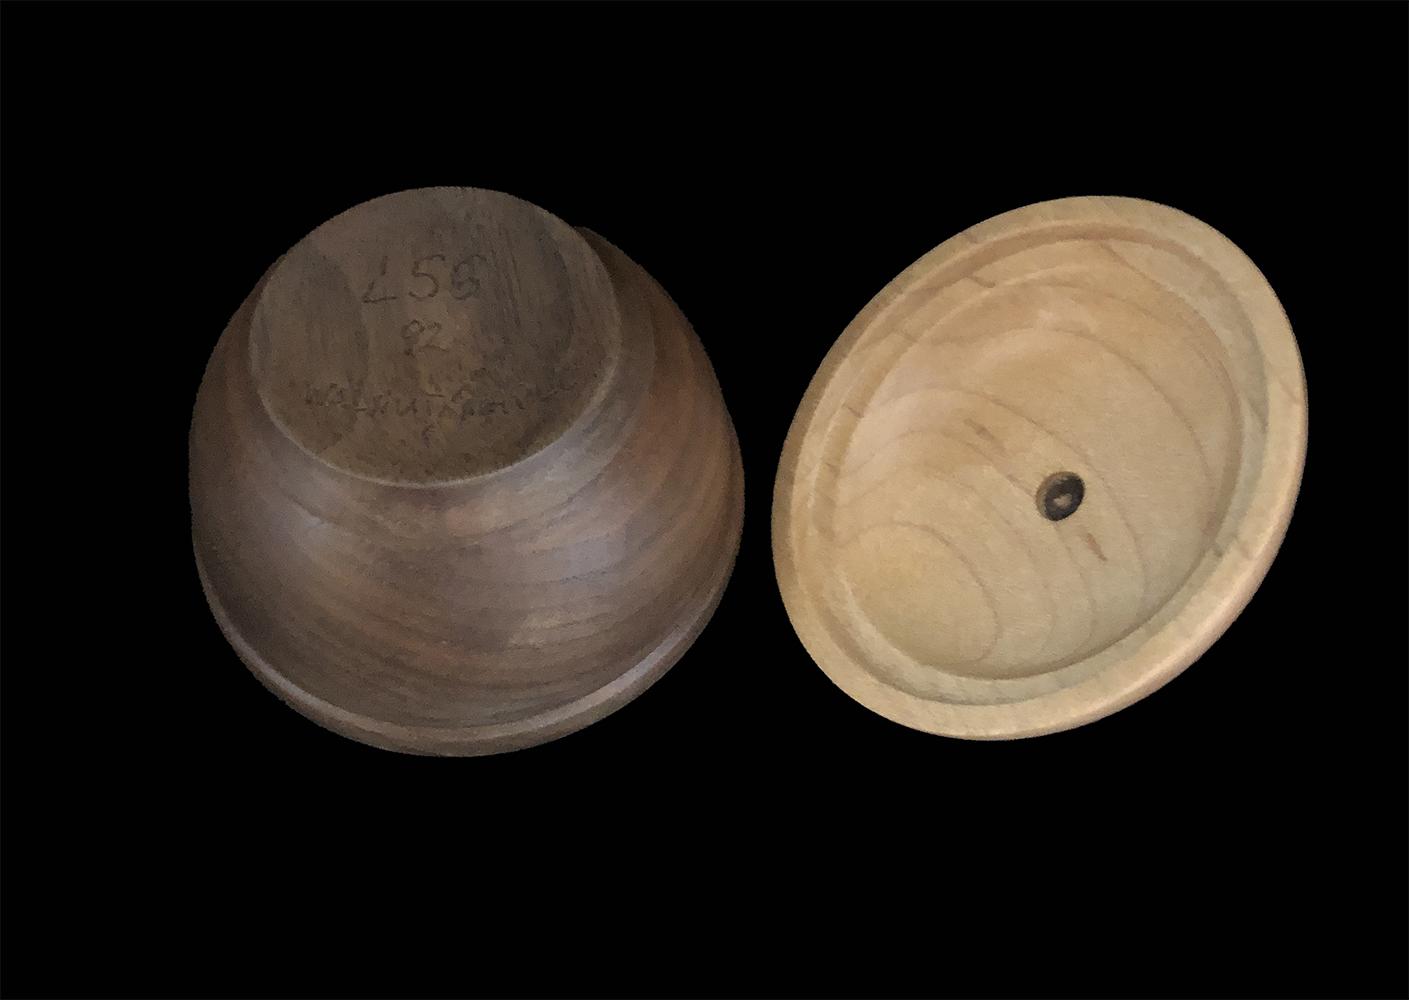 walnut box with maple lid and walnut finial